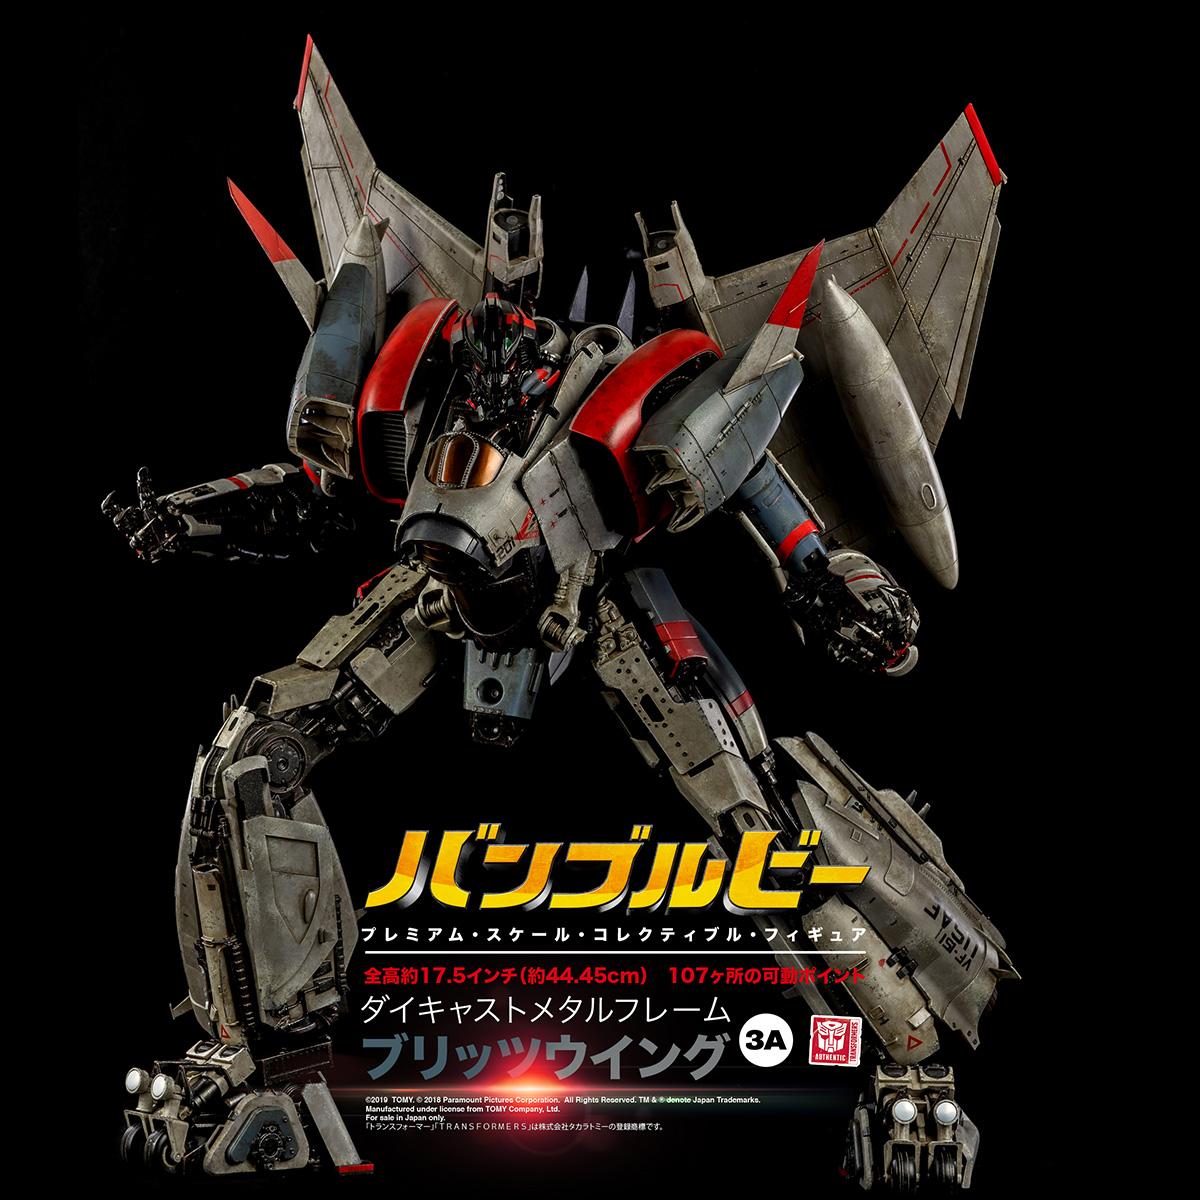 Blitzwing_PM_JAP_1071.jpg